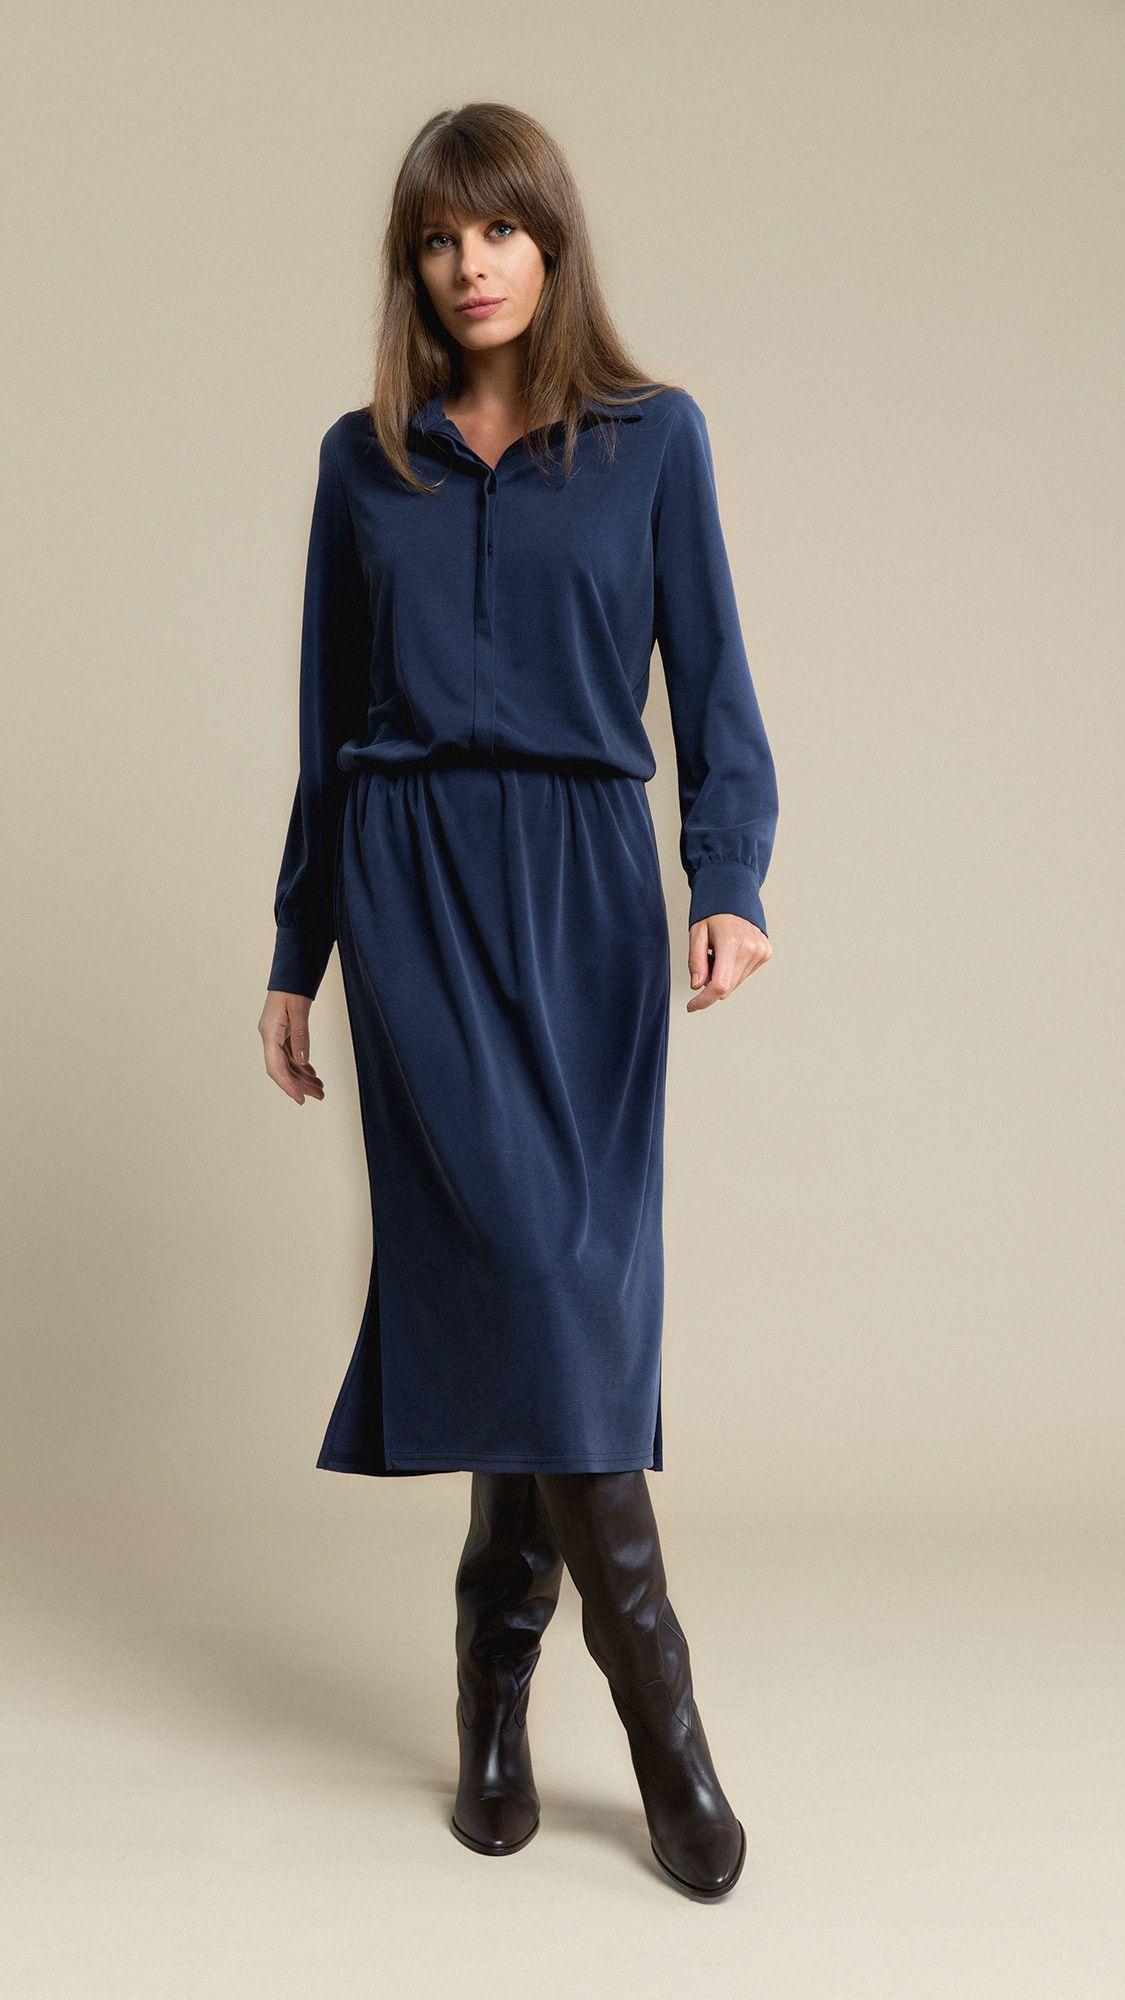 Dress Linda Navy